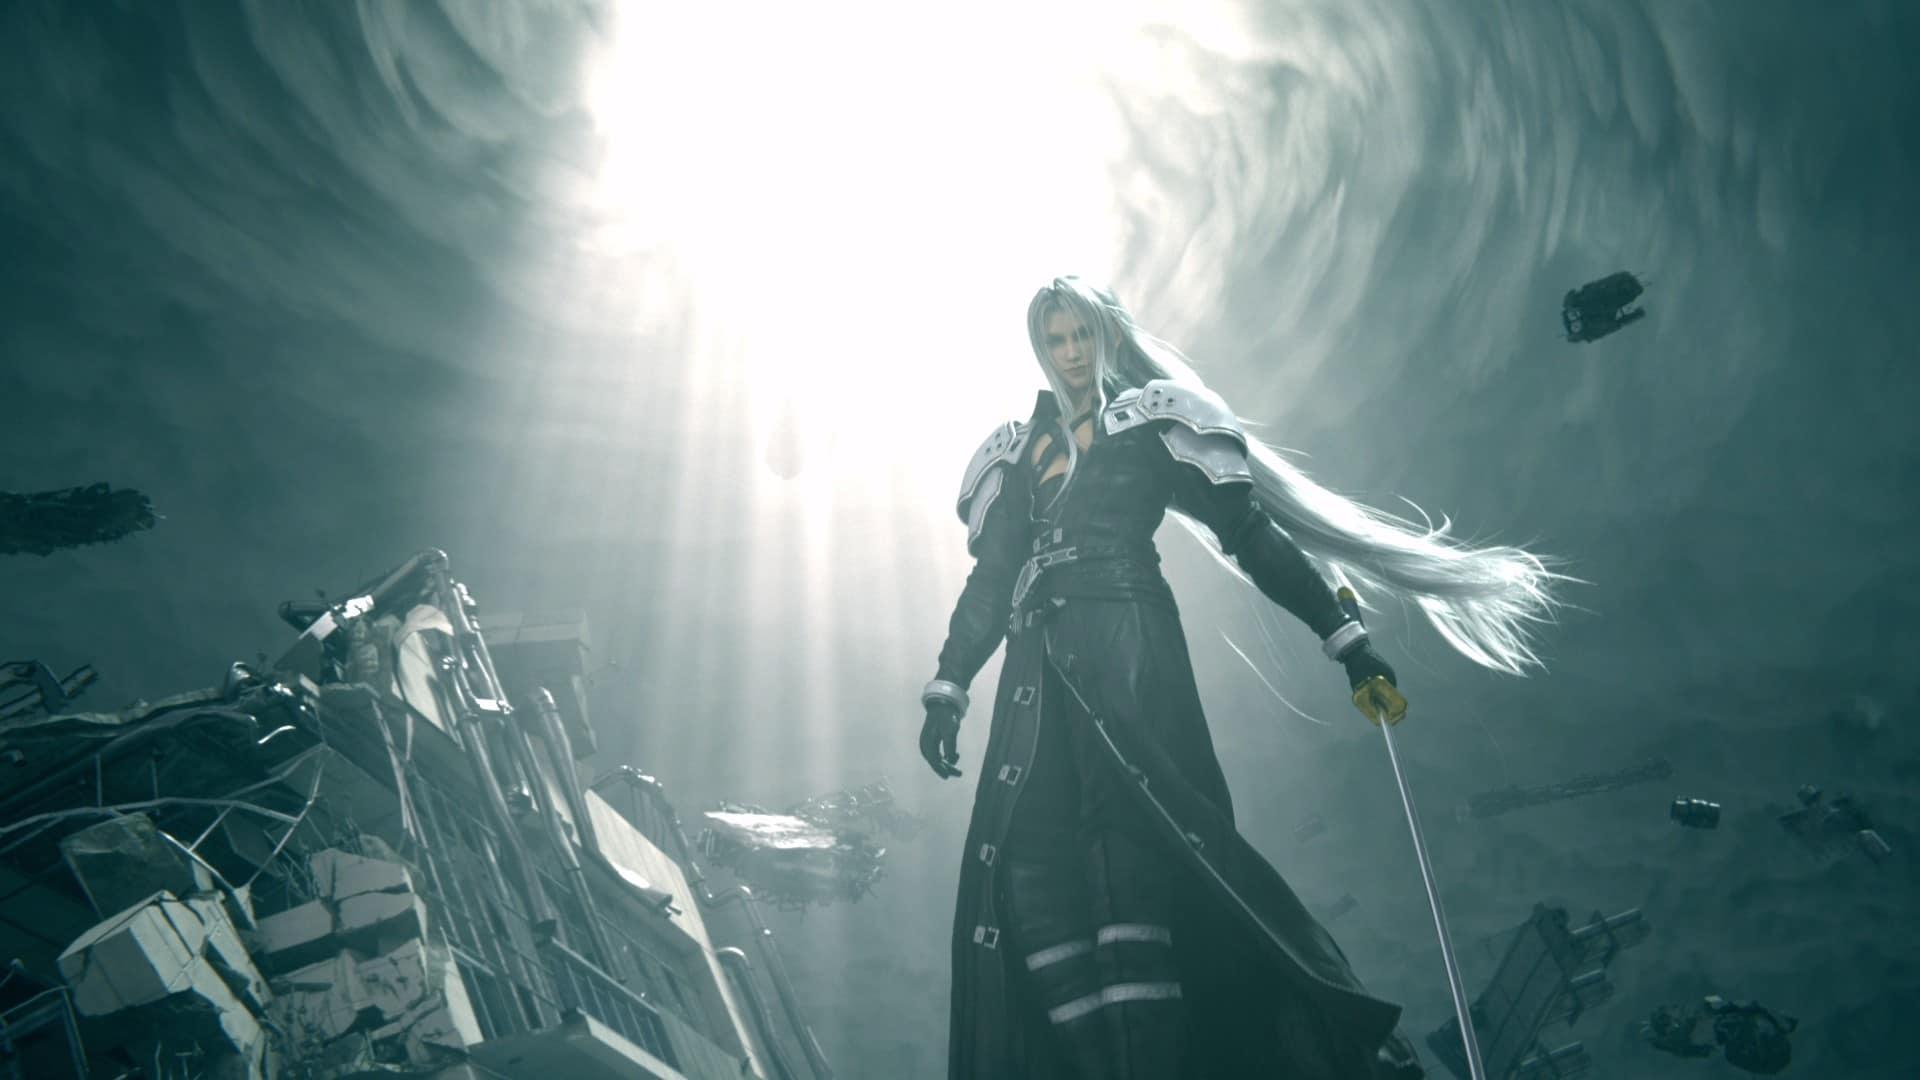 Sephiroth - Final Fantasy VII Remake